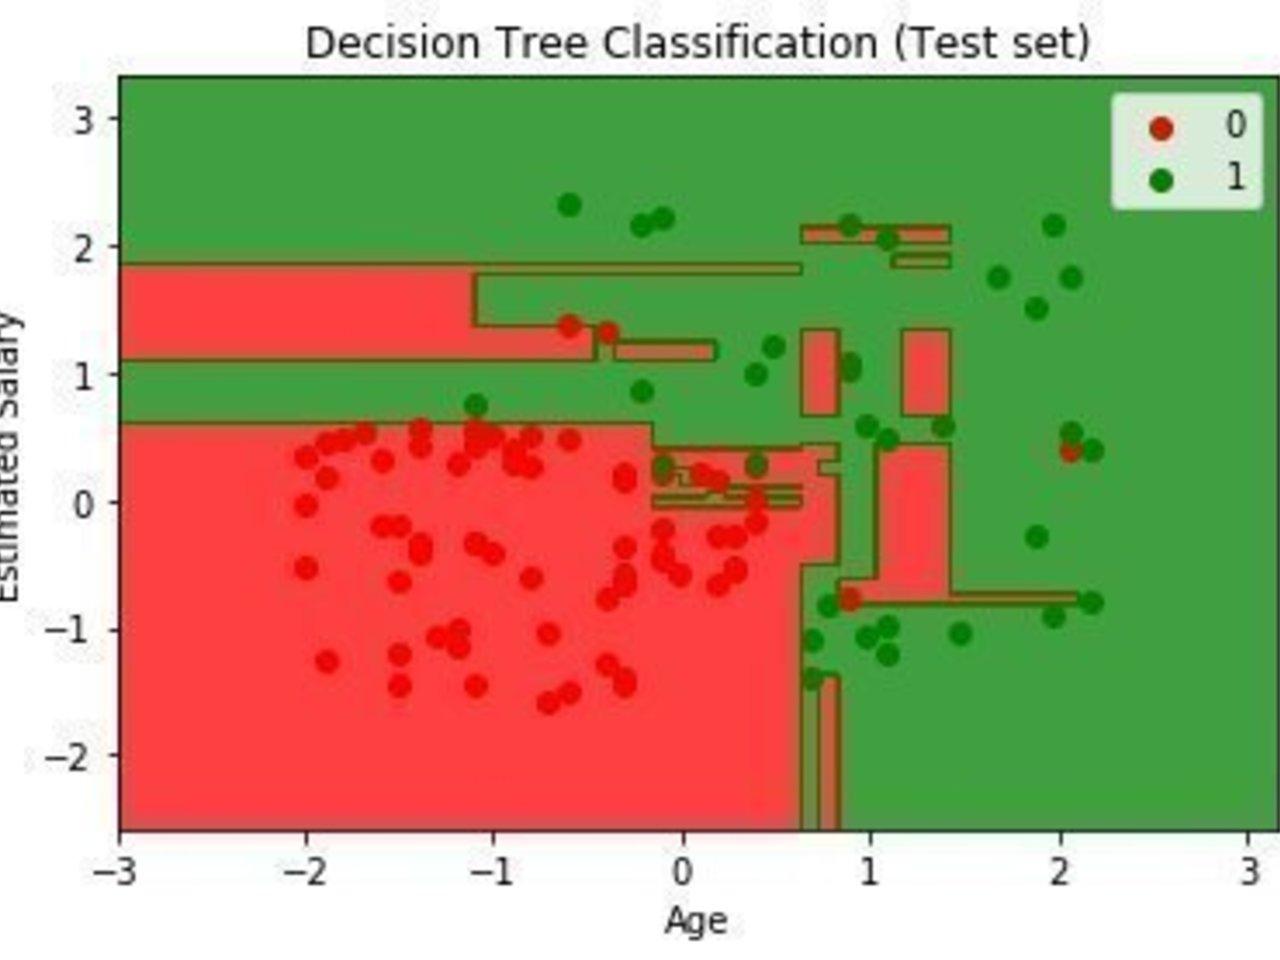 Car sales prediction using Decision Tree Classification | Intel DevMesh